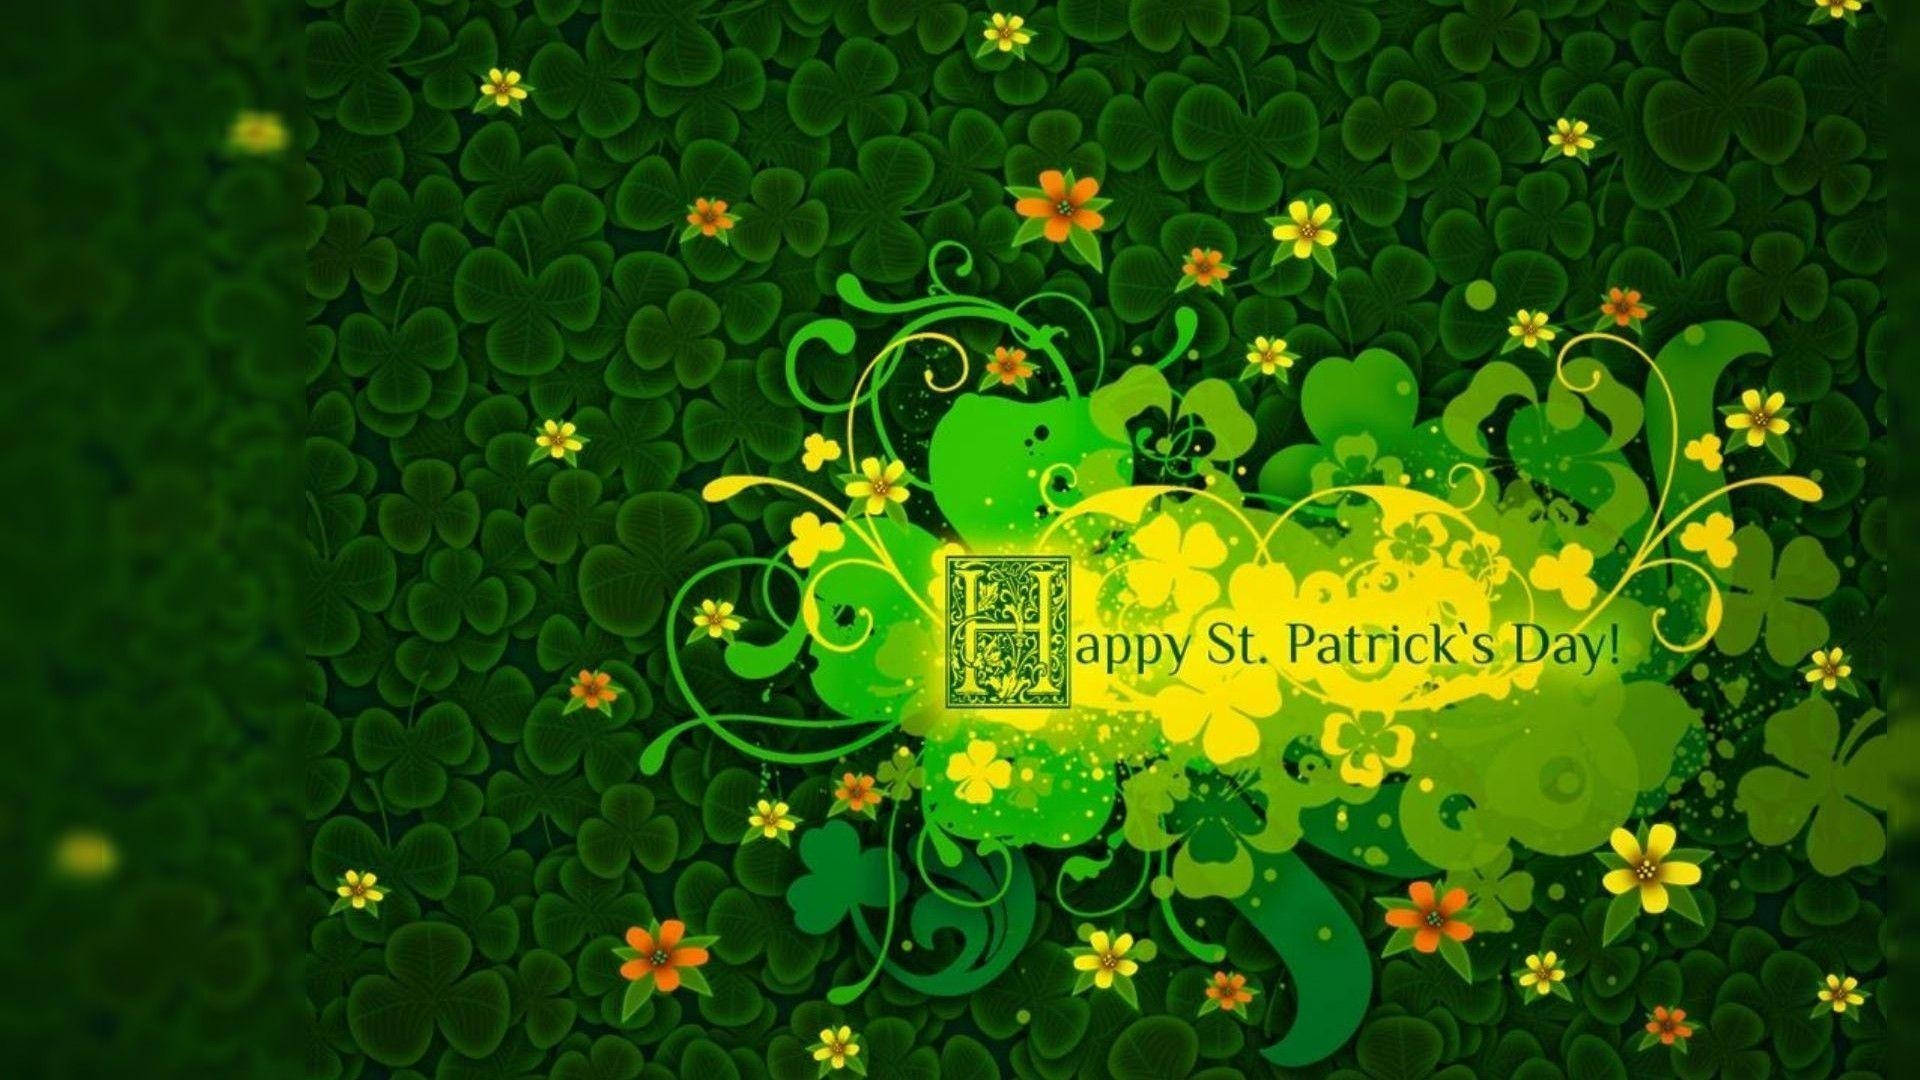 St. Patrick's Day 2021 Desktop Wallpaper